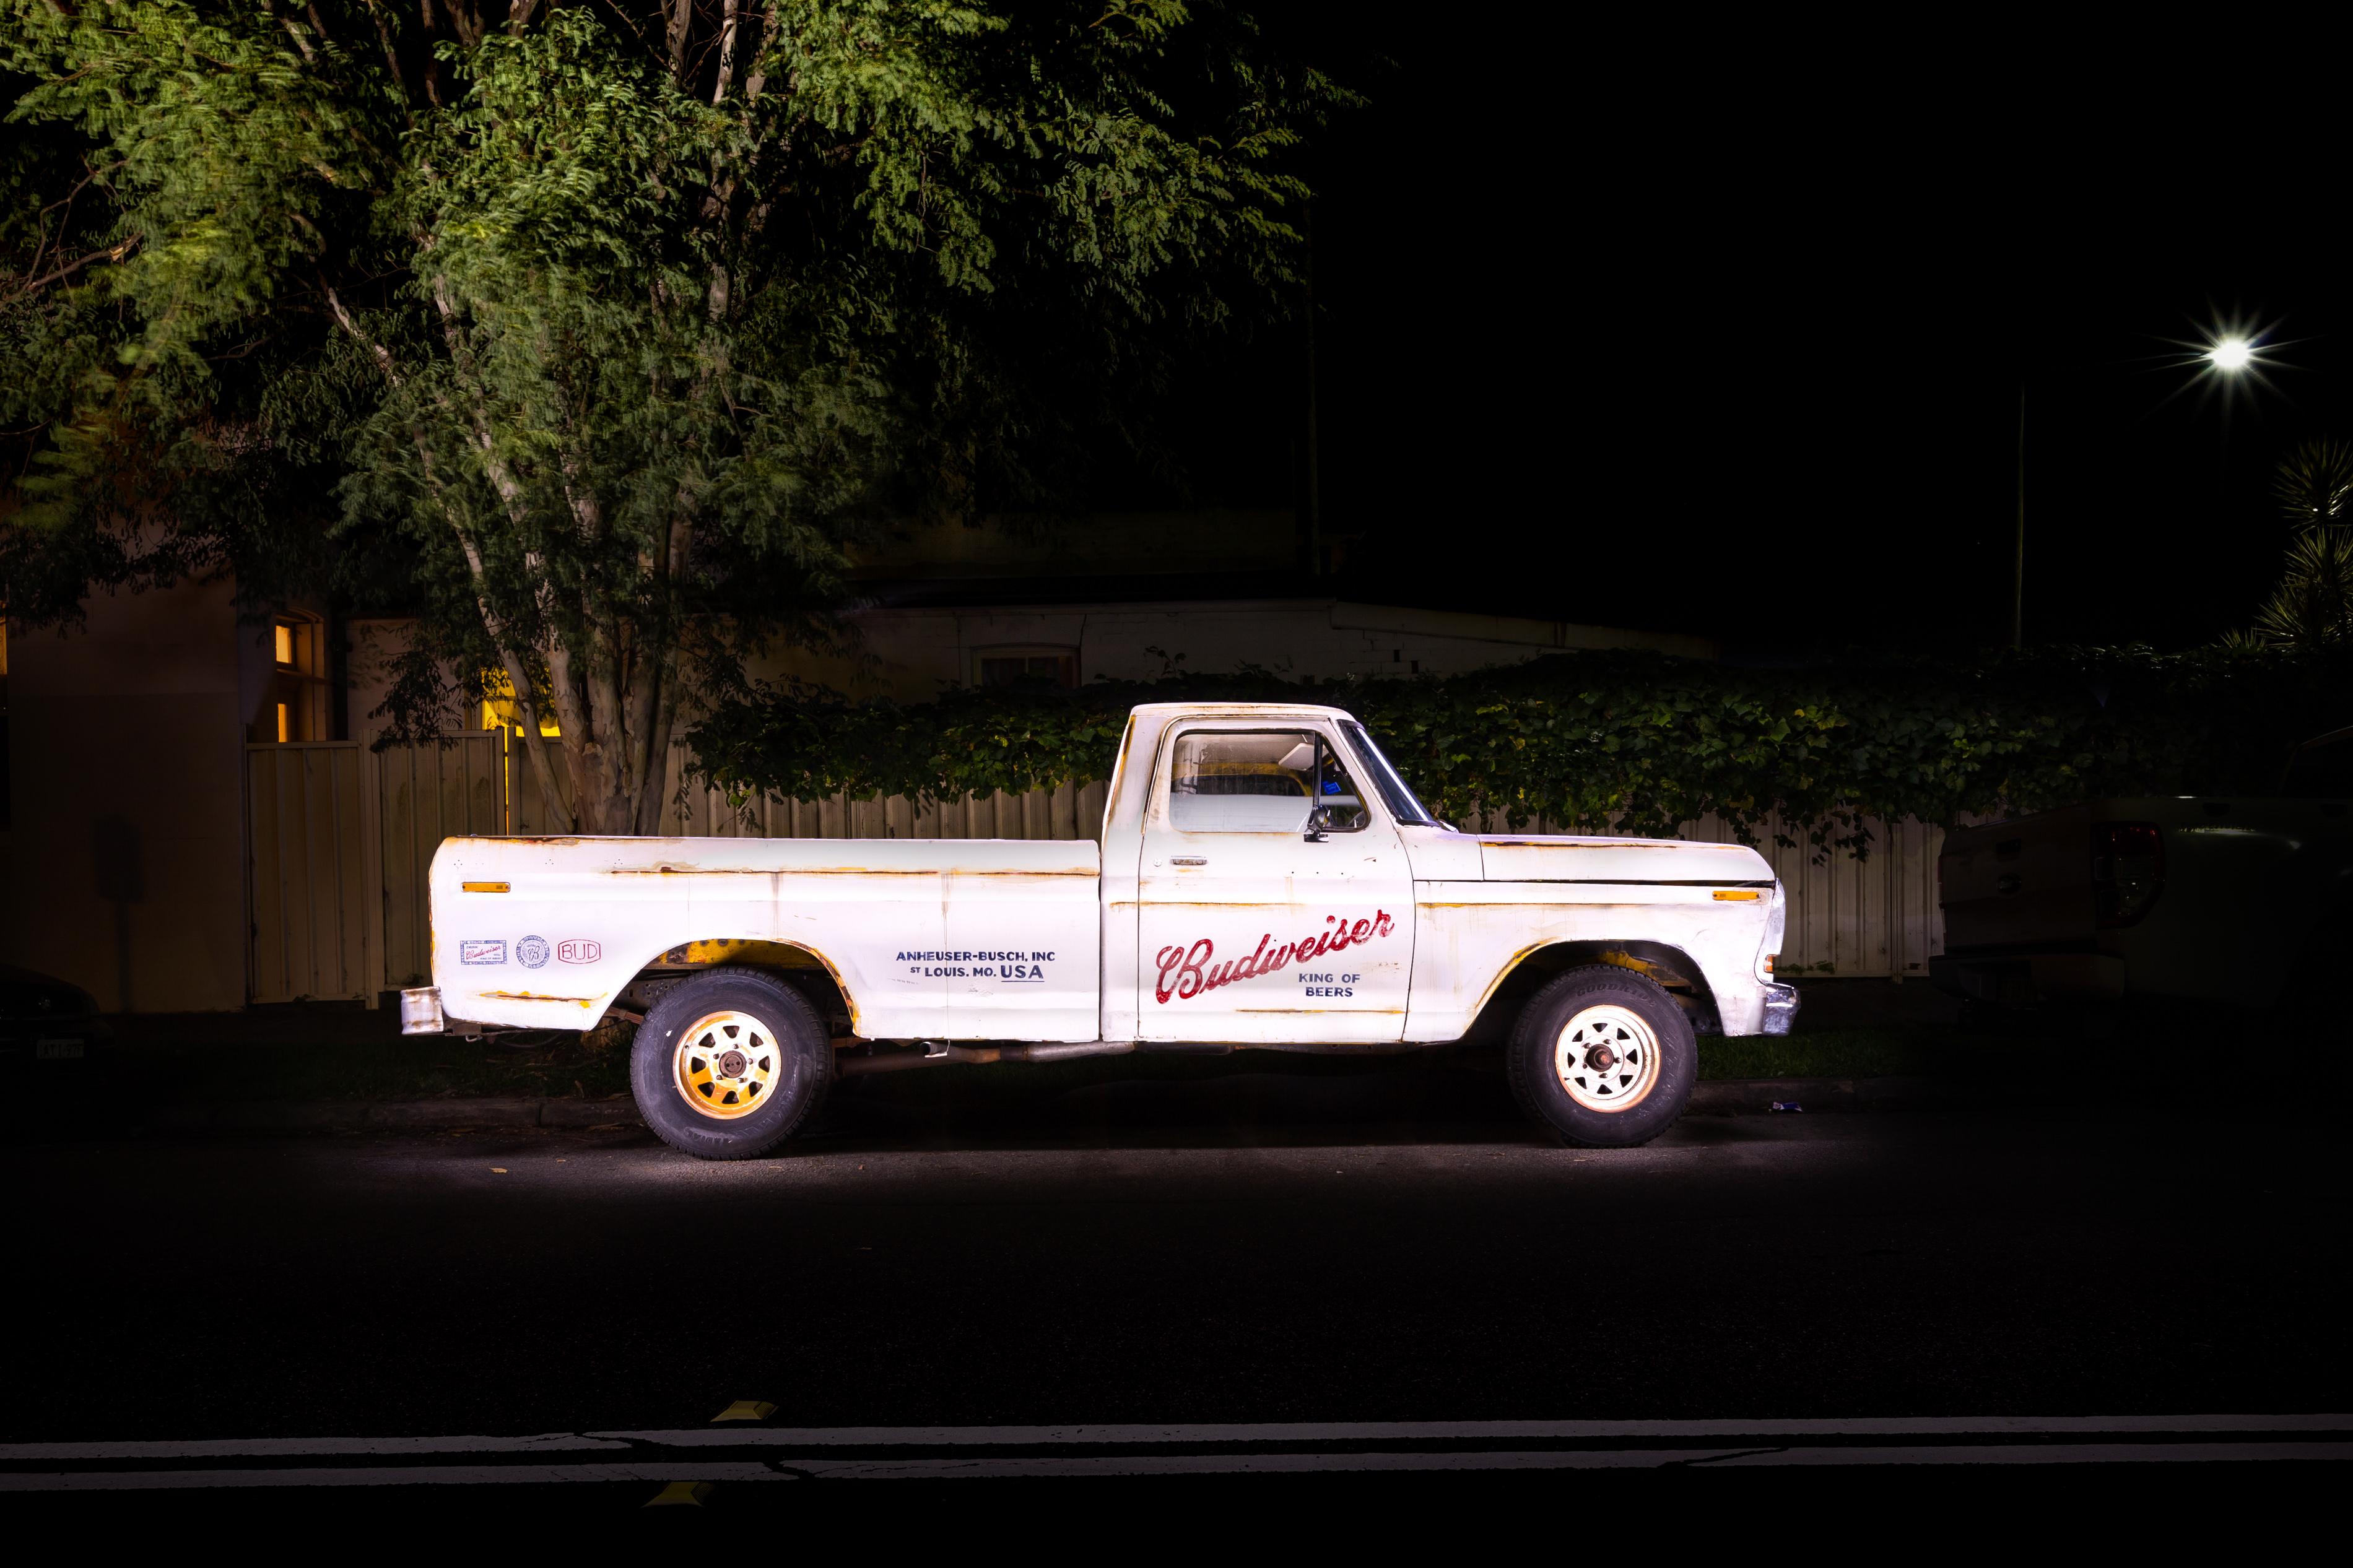 Budweiser F150 Truck Long Exposure night automotive photography & light painting